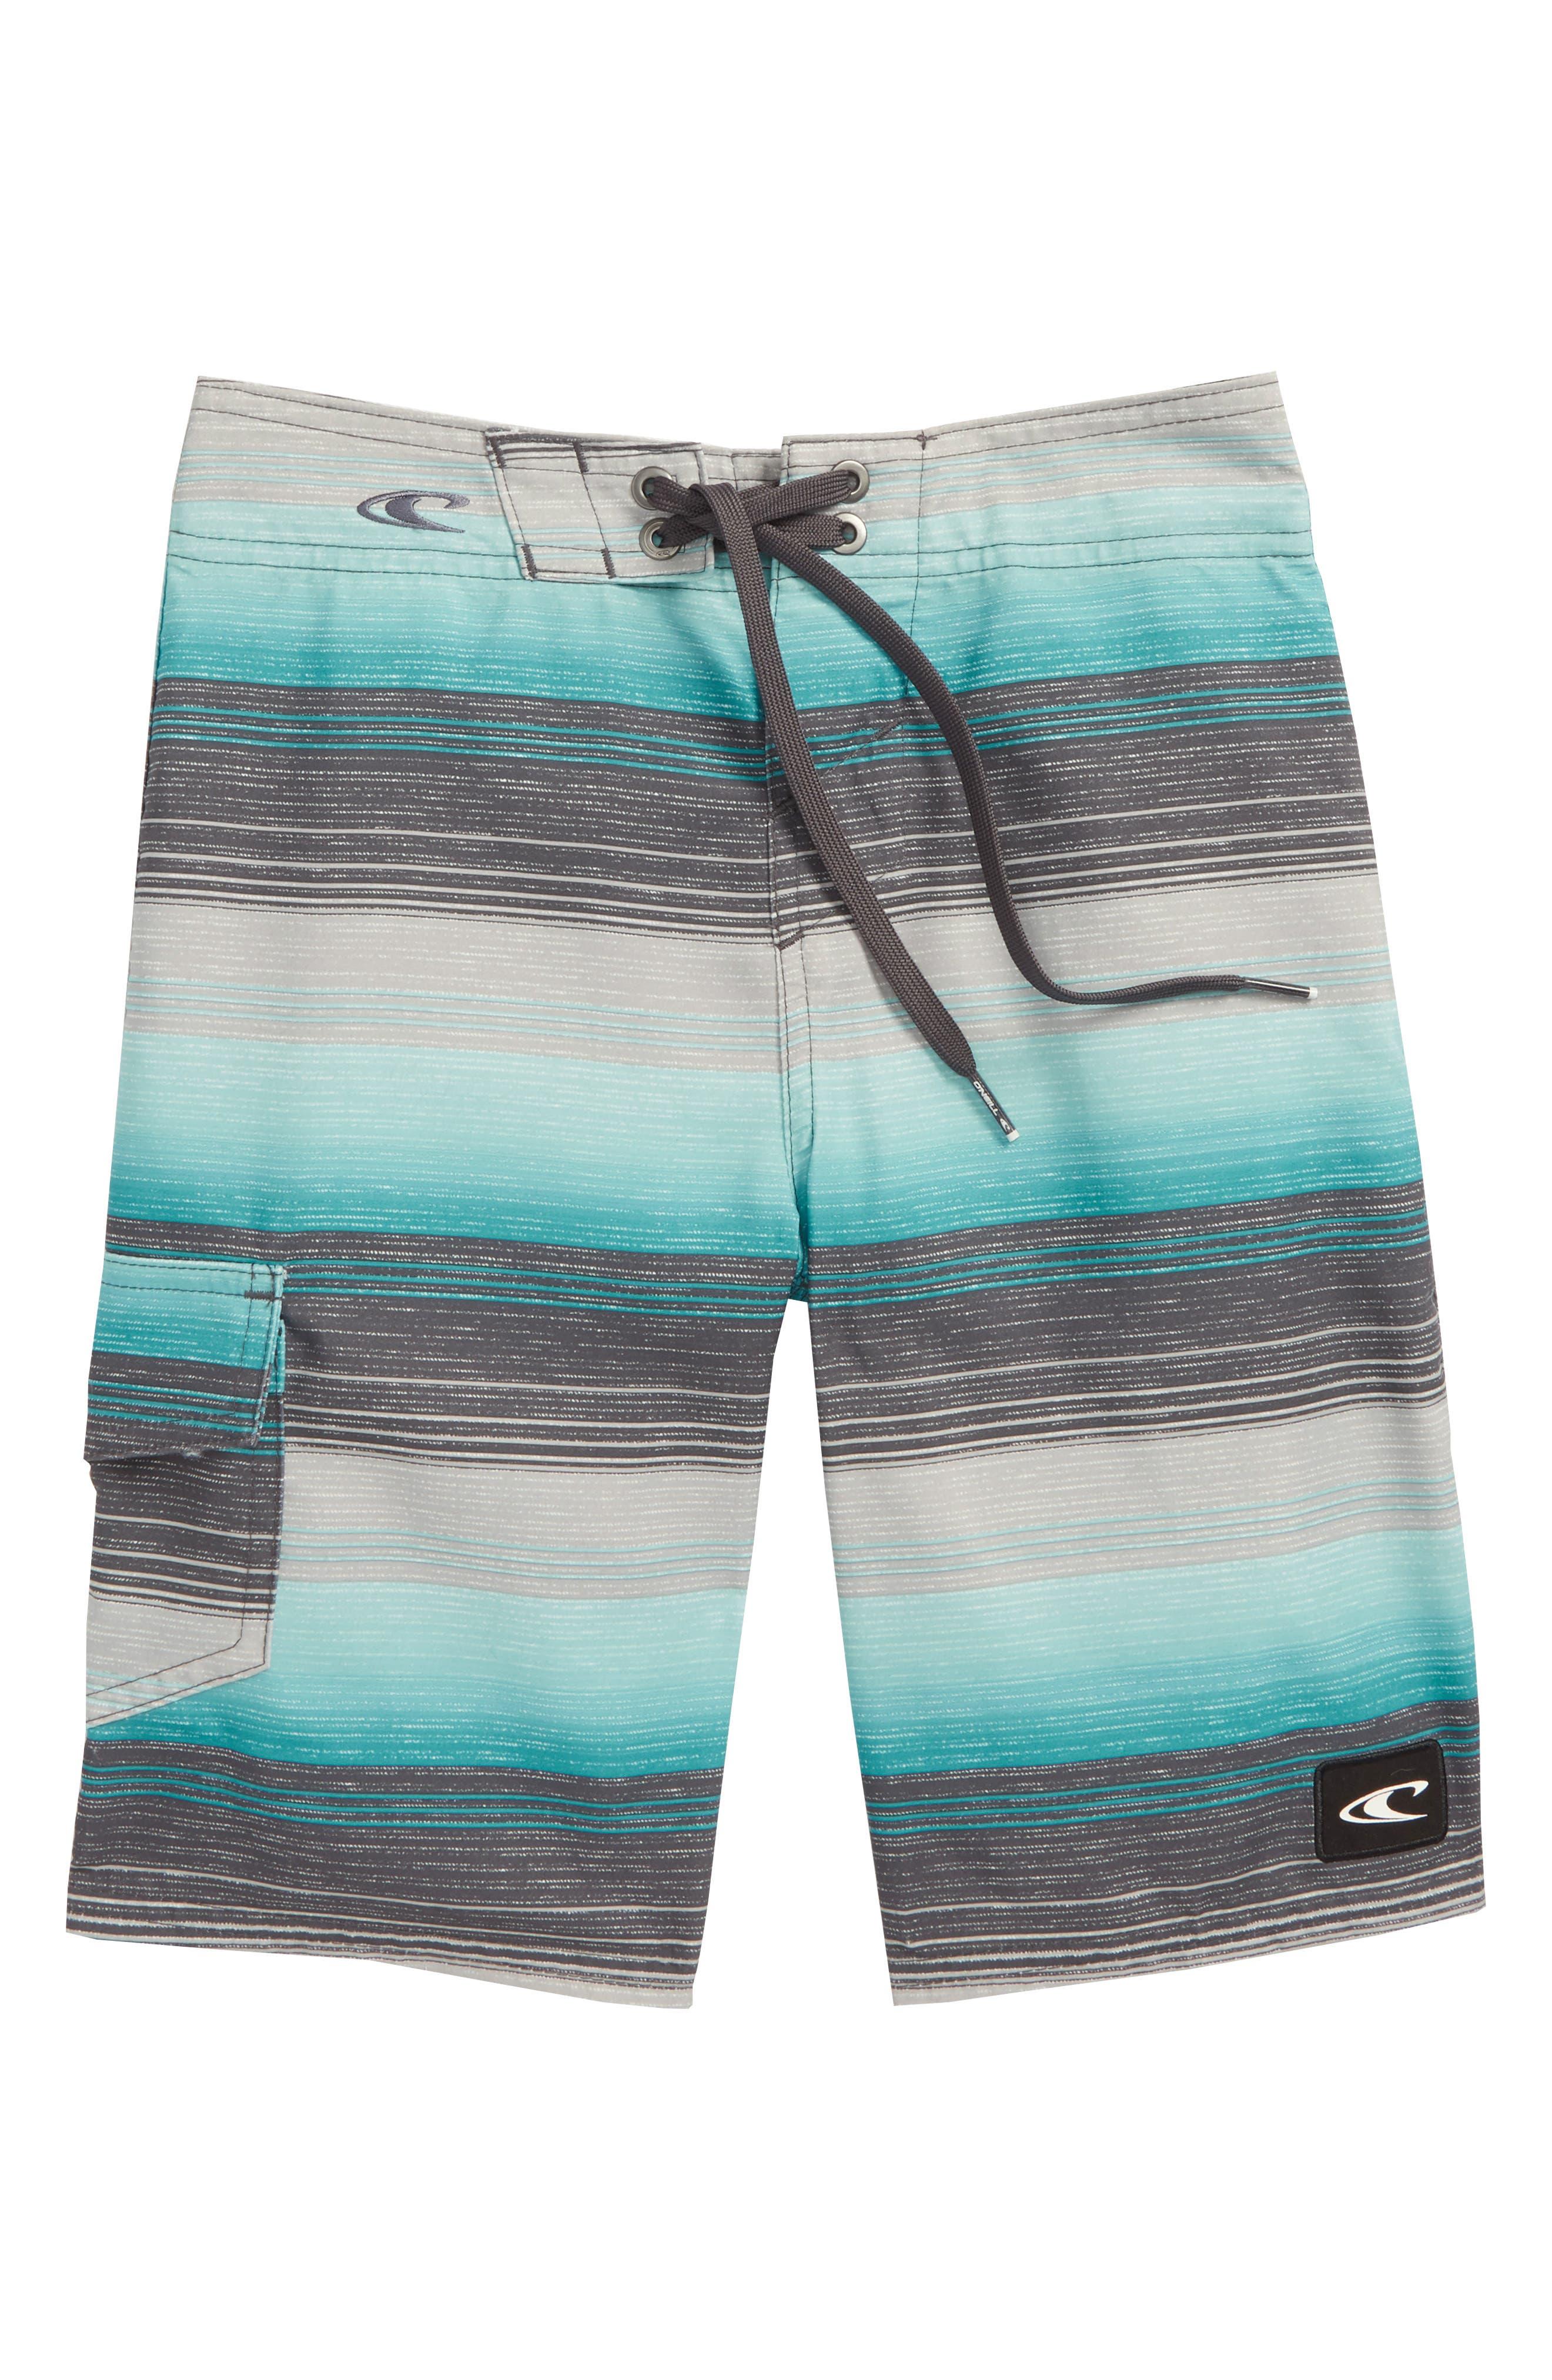 Santa Cruz Stripe Board Shorts,                             Main thumbnail 1, color,                             Ocean